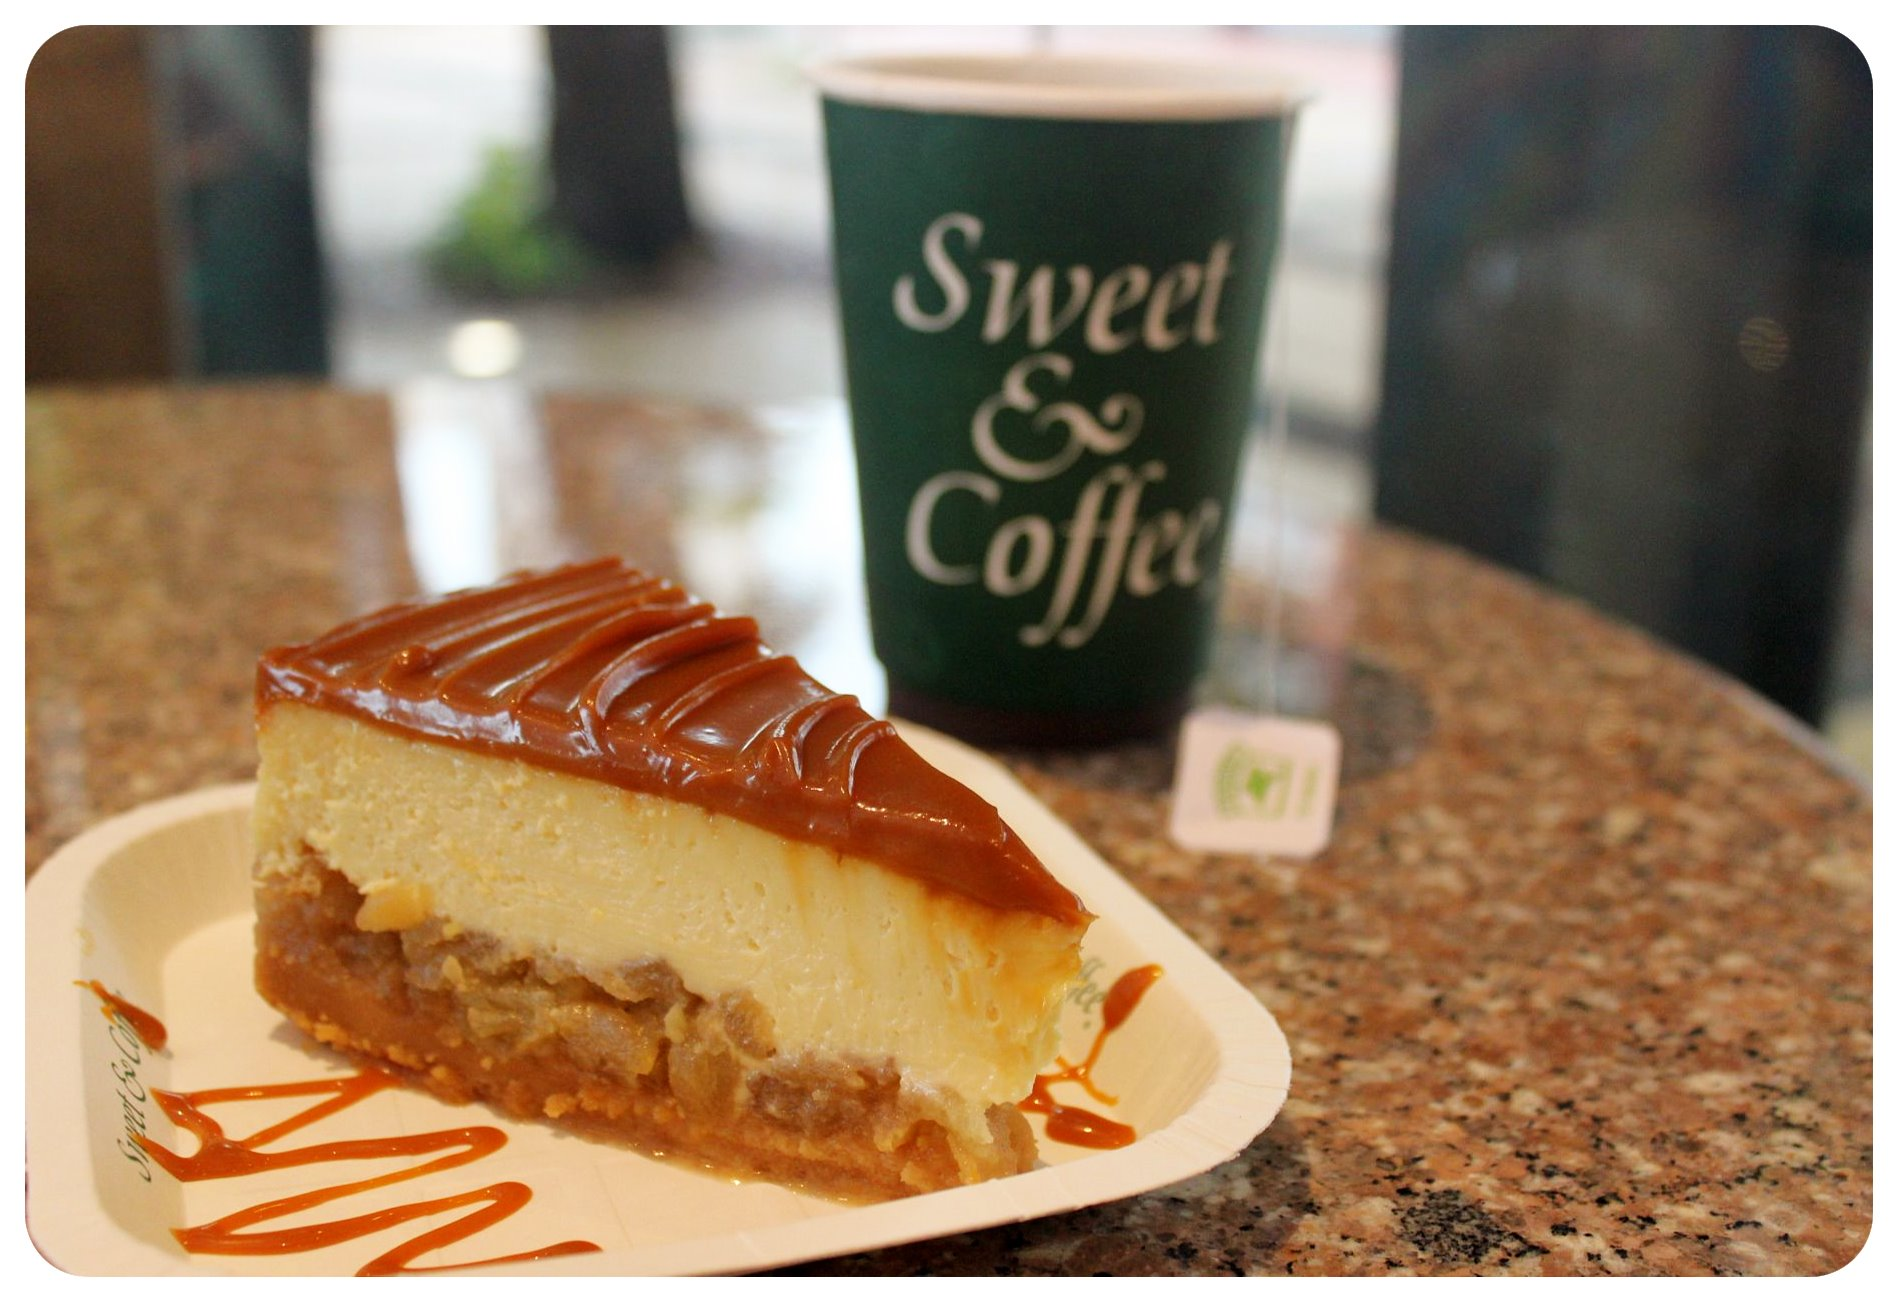 guayaquil sweet & coffee